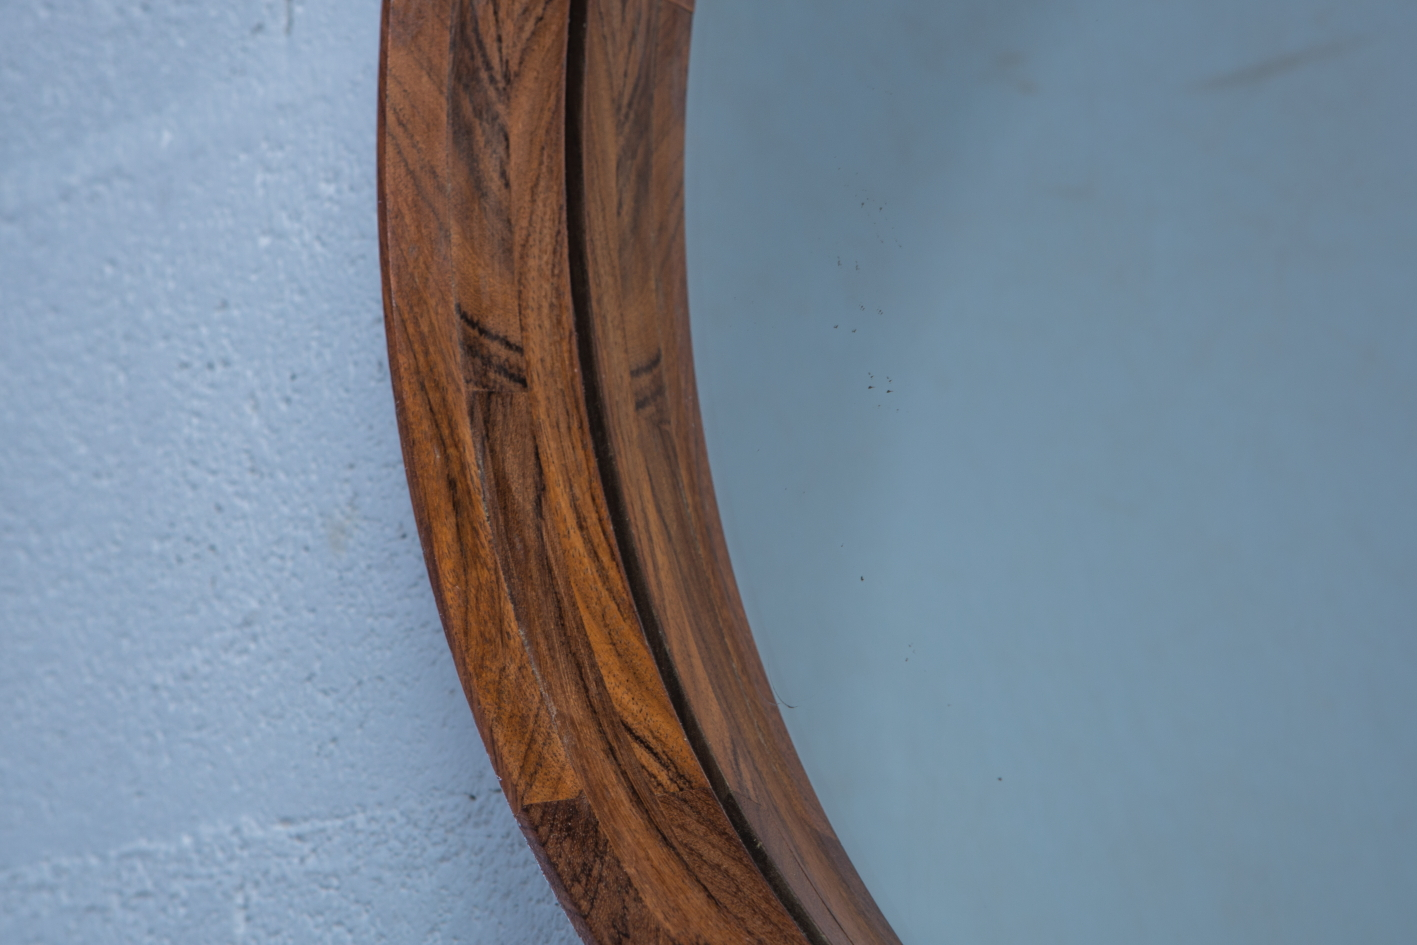 Unique Mid Century Italian Wood Round Mirror produced by Poggi Pavia 1950s Italy - Frame detail